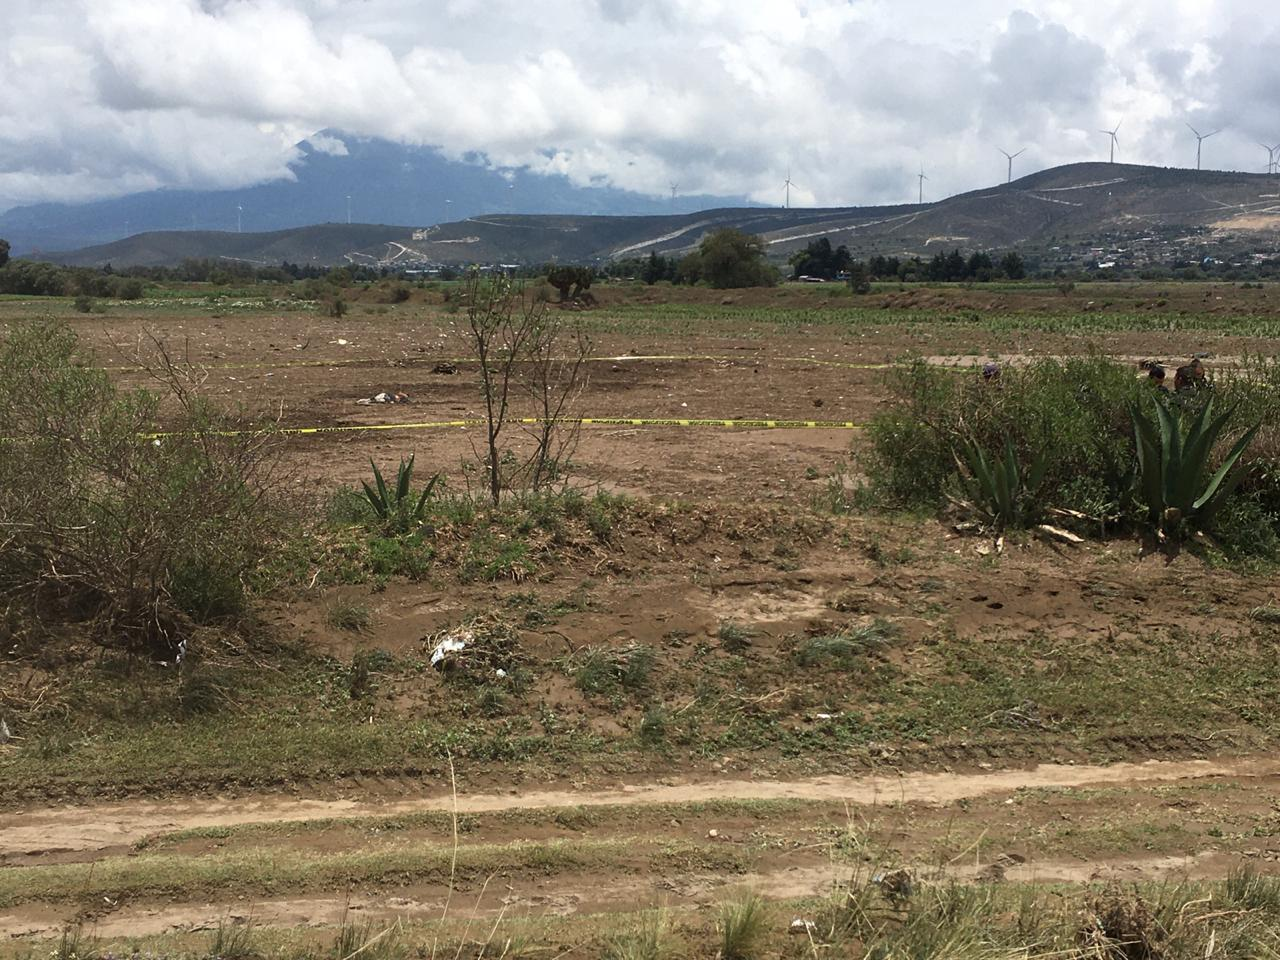 Hallan cadáver de un sujeto en terrenos de cultivo en Cañada Morelos